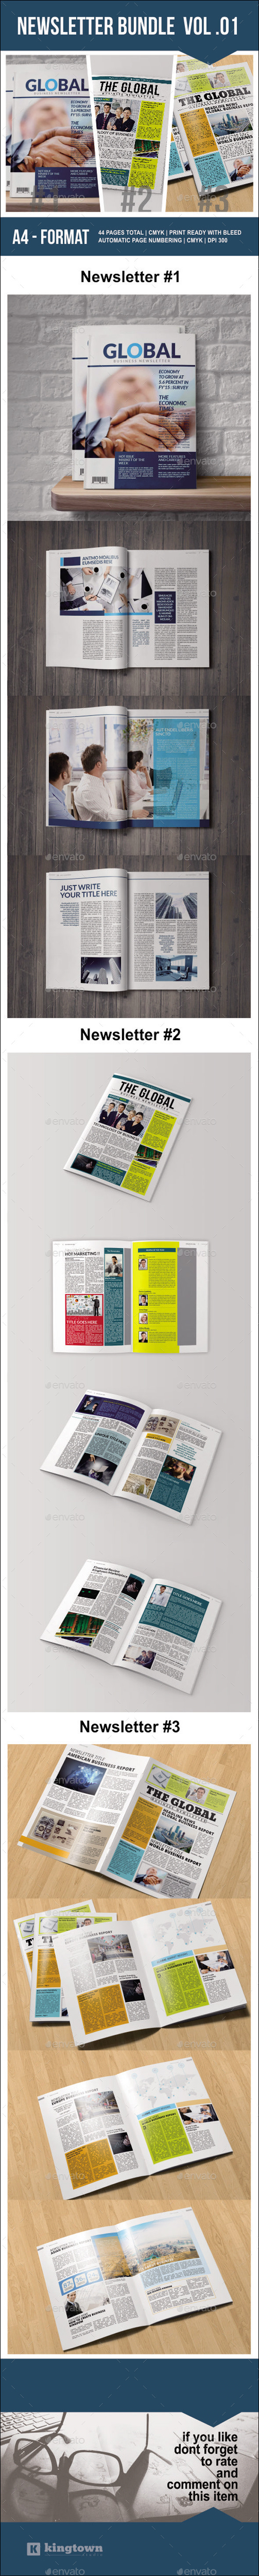 Newsletter Bundle Vol. 01 - Newsletters Print Templates